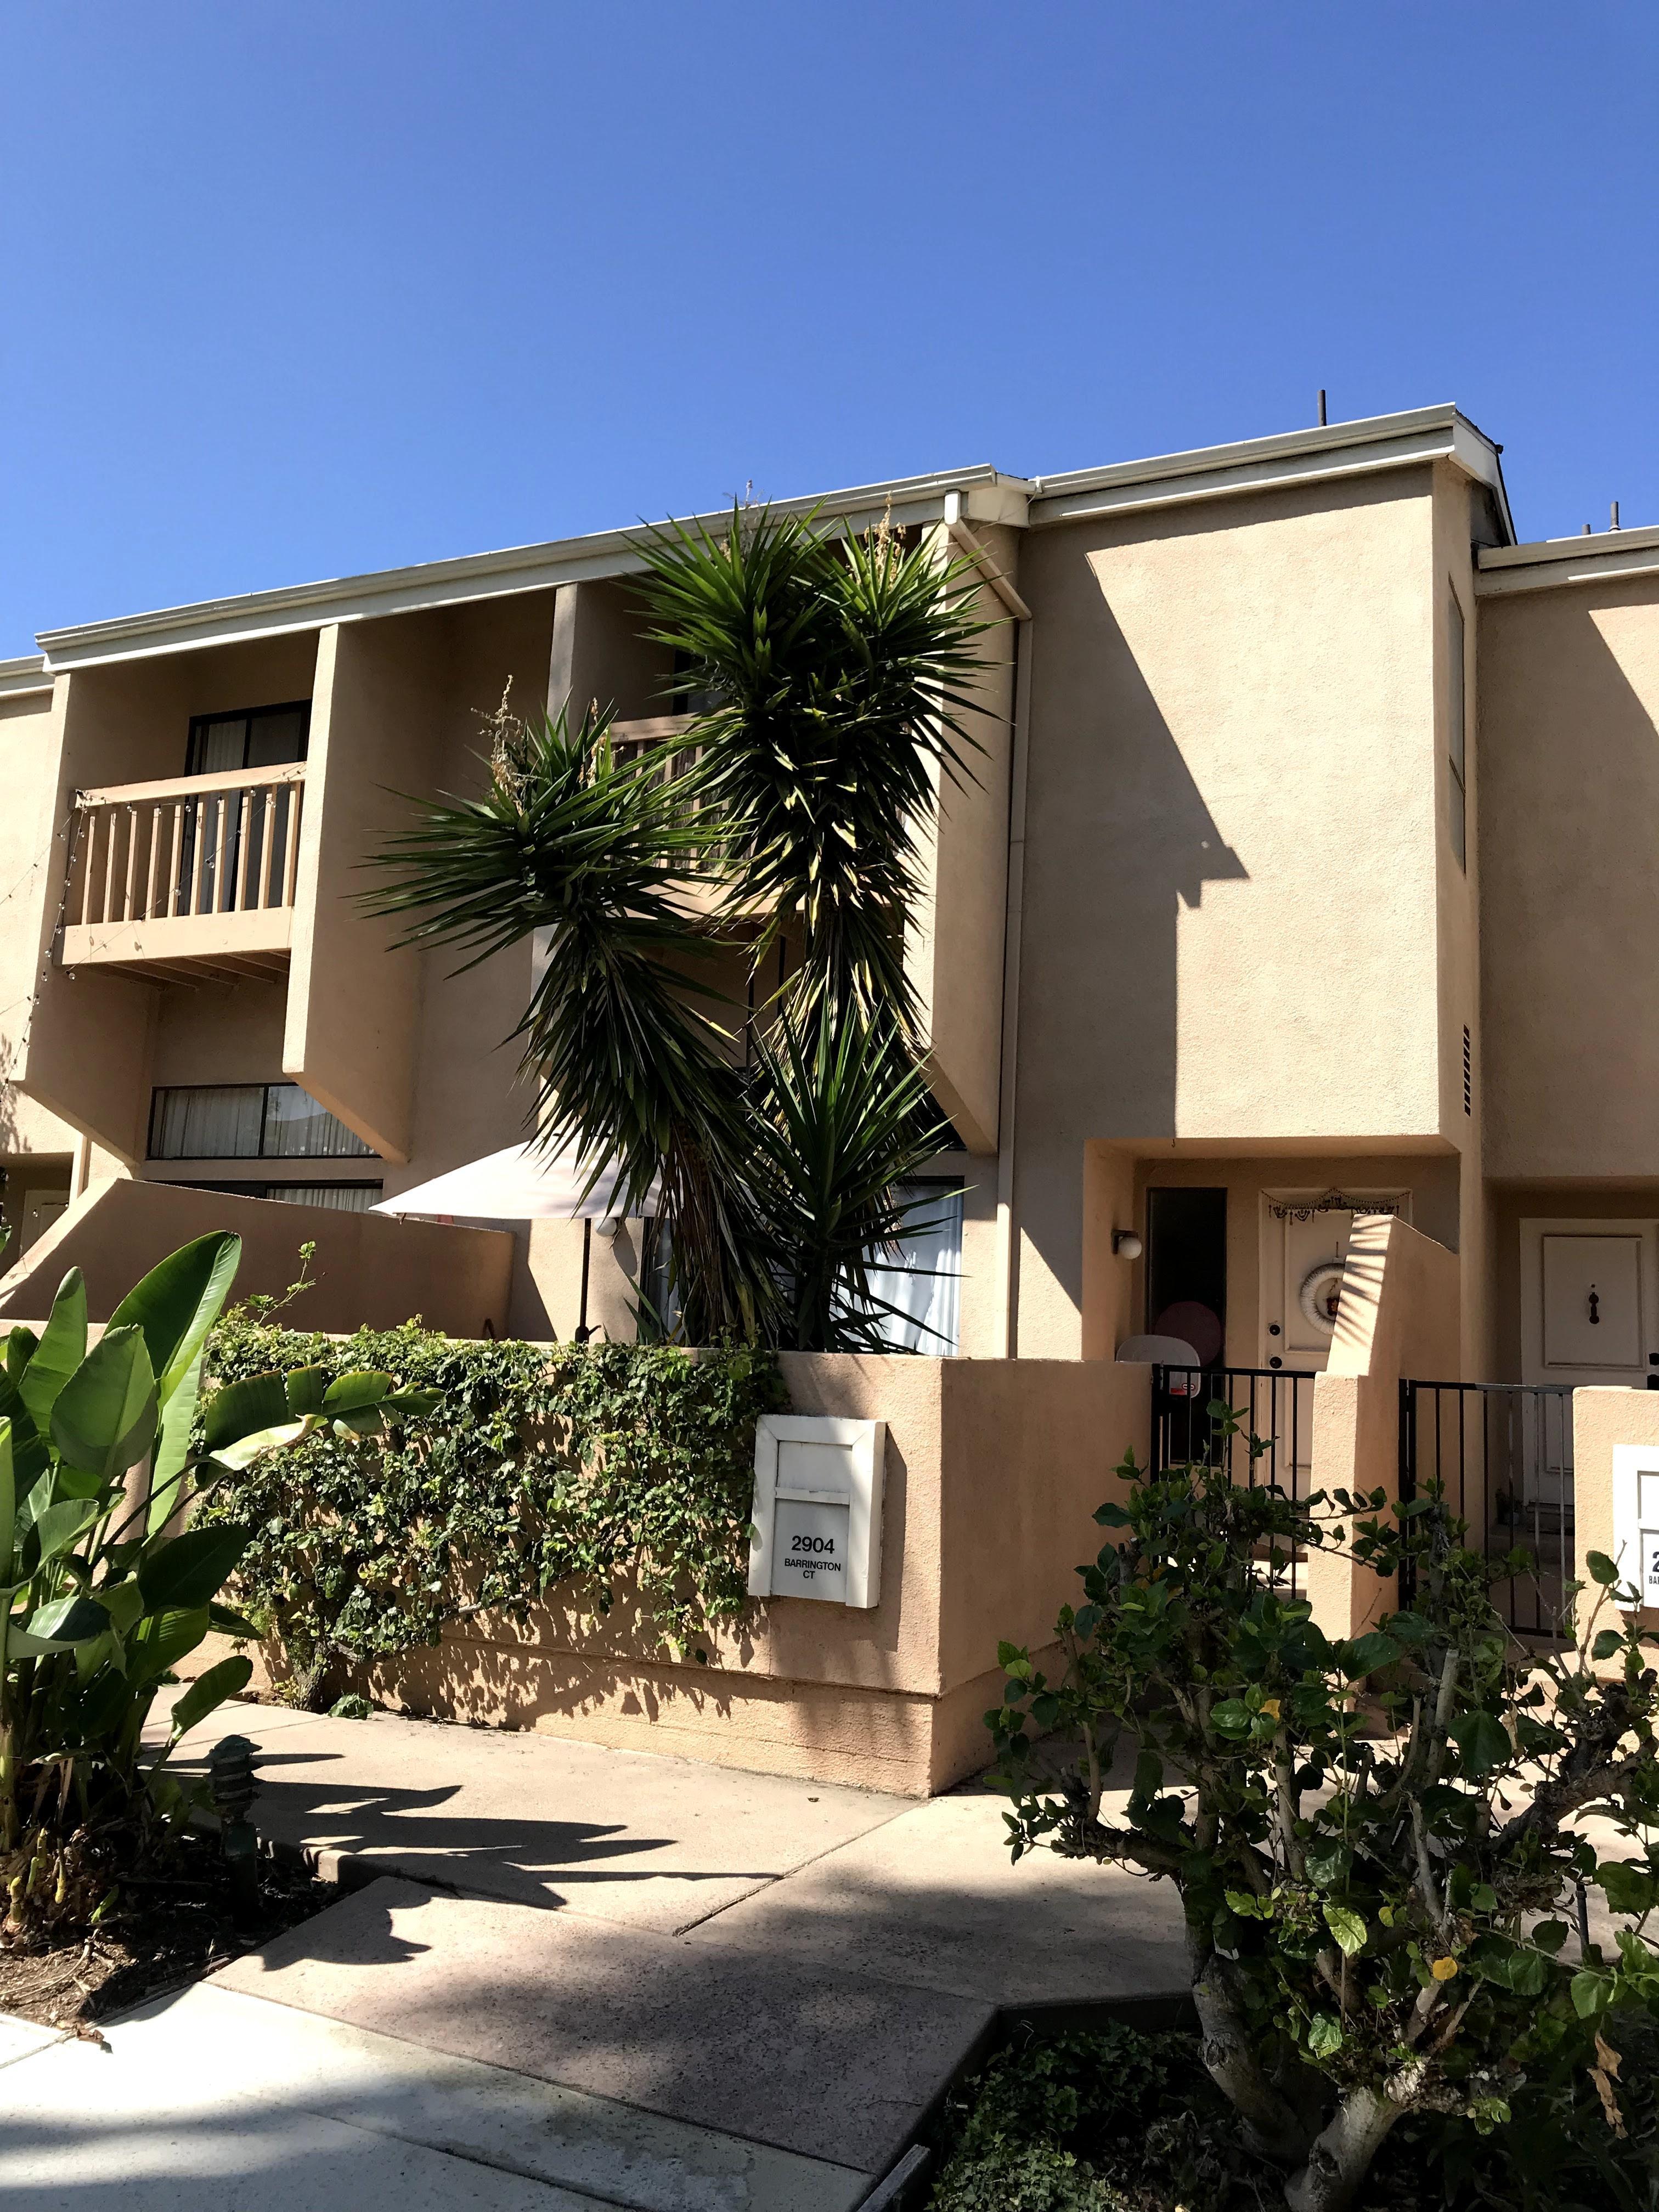 Property Image for 2904 Barrington Court